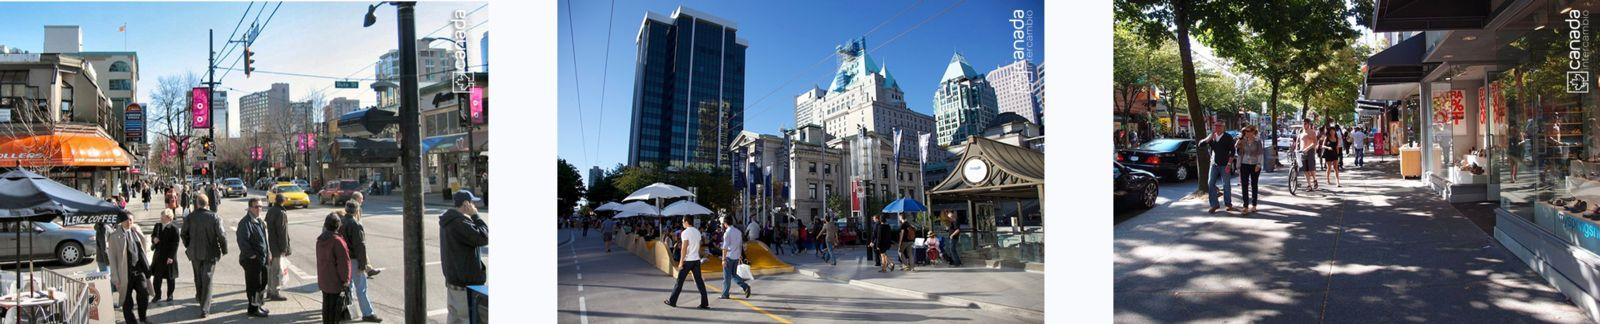 Ponto turistico em Vancouver, Robson Street